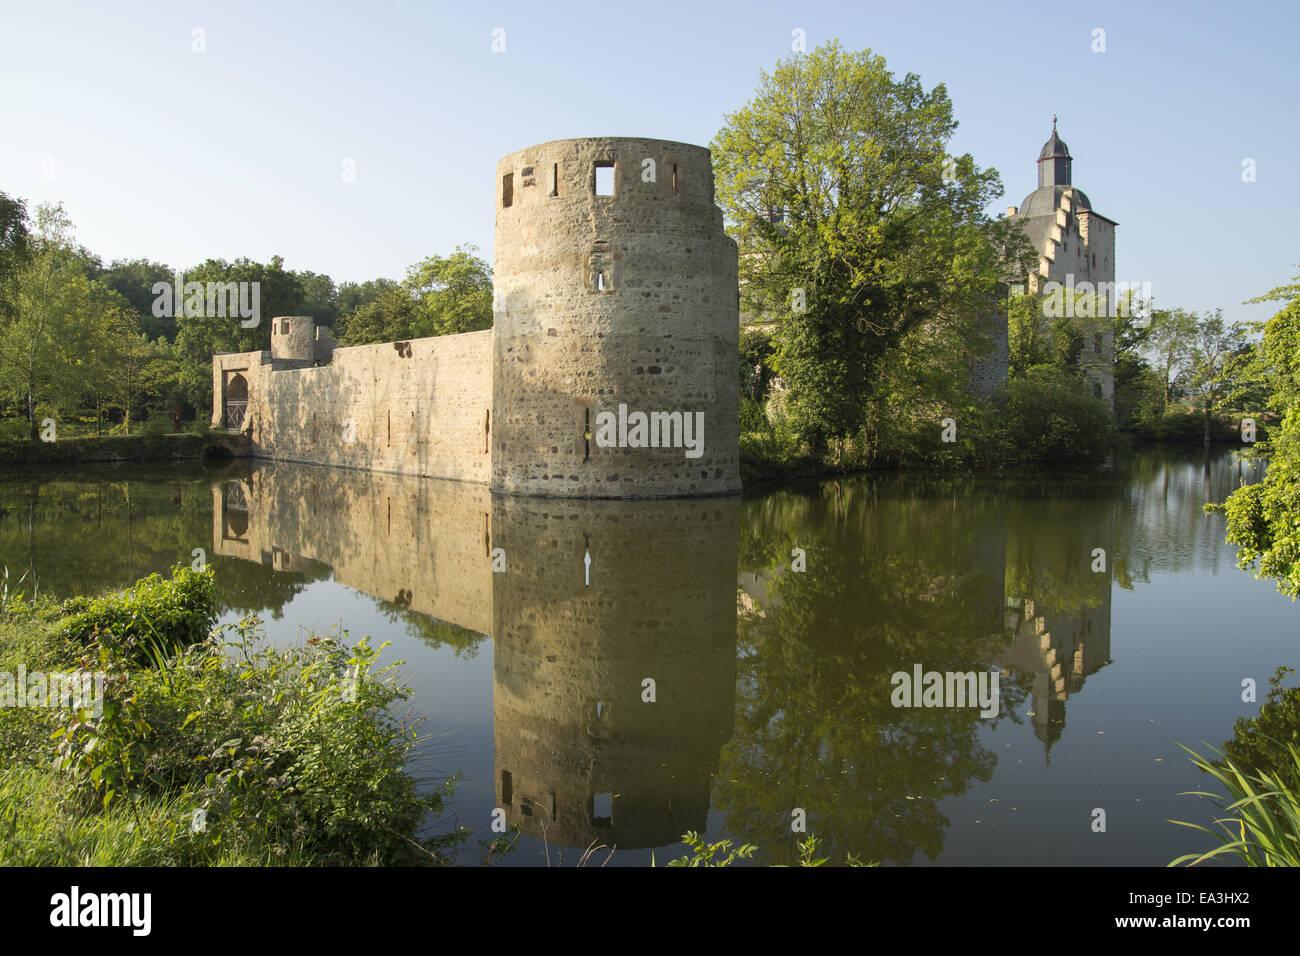 Castle veynau euskirchen wisskirchen germany stock photo royalty free image 75067946 alamy - Euskirchen mobel ...